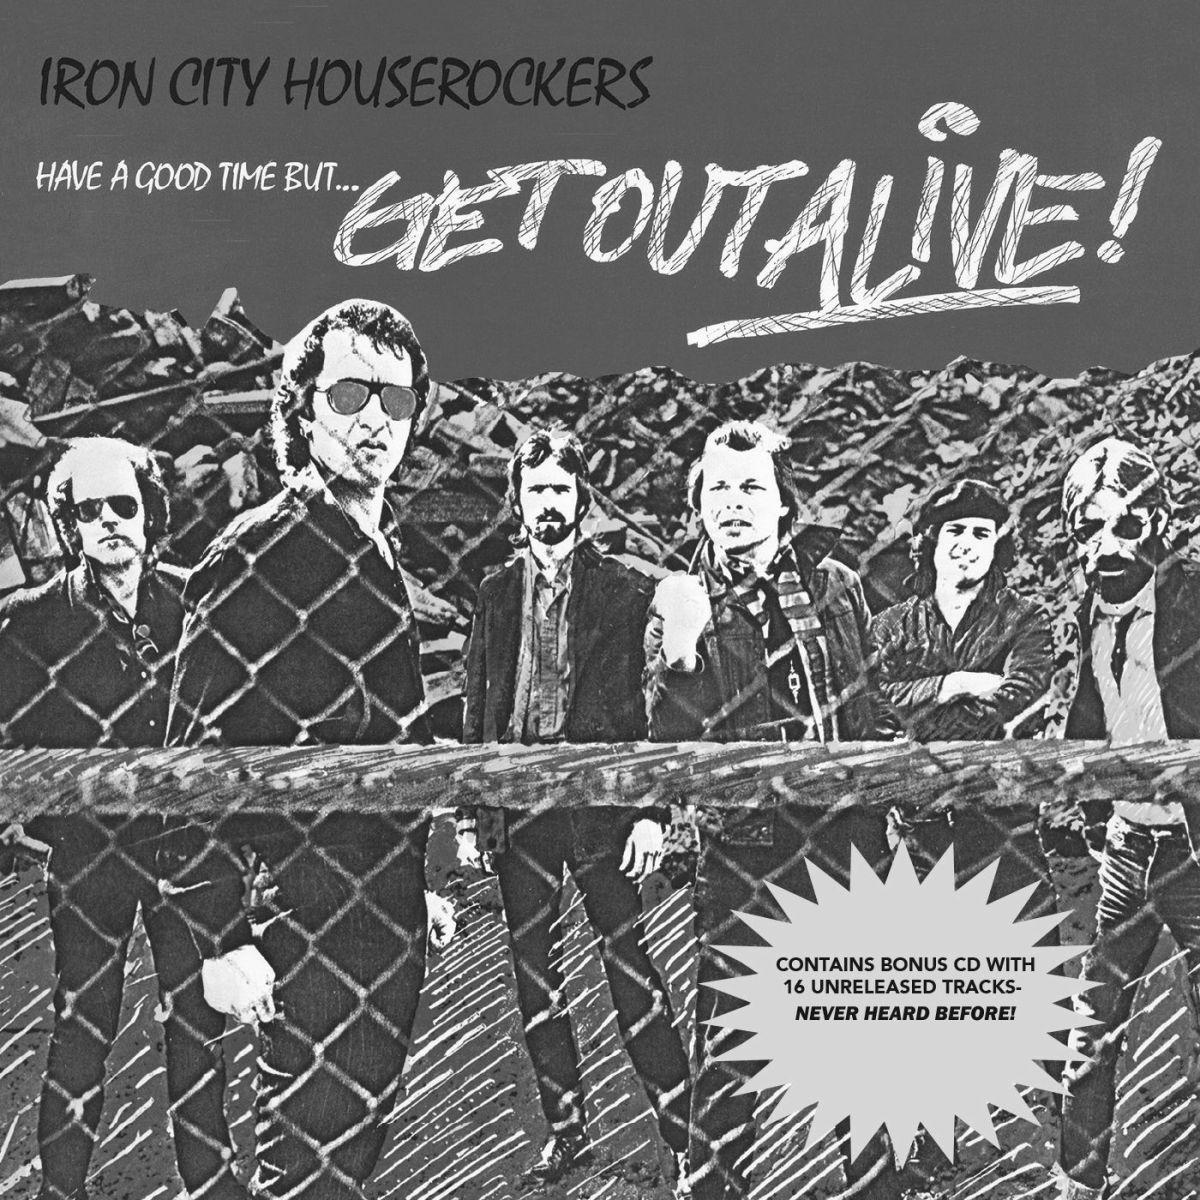 Iron City Houserockers